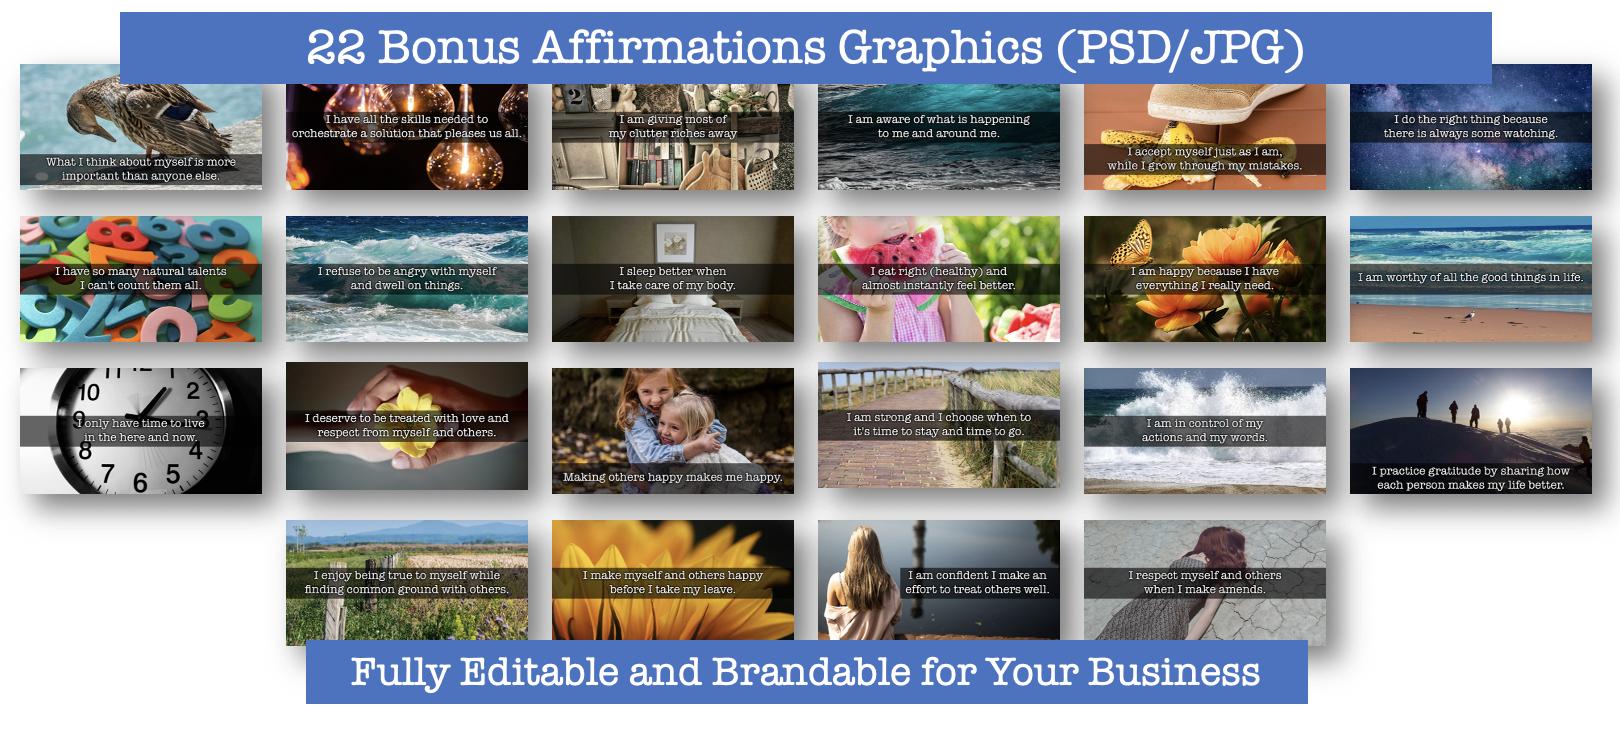 22 Bonus Affirmations Graphics